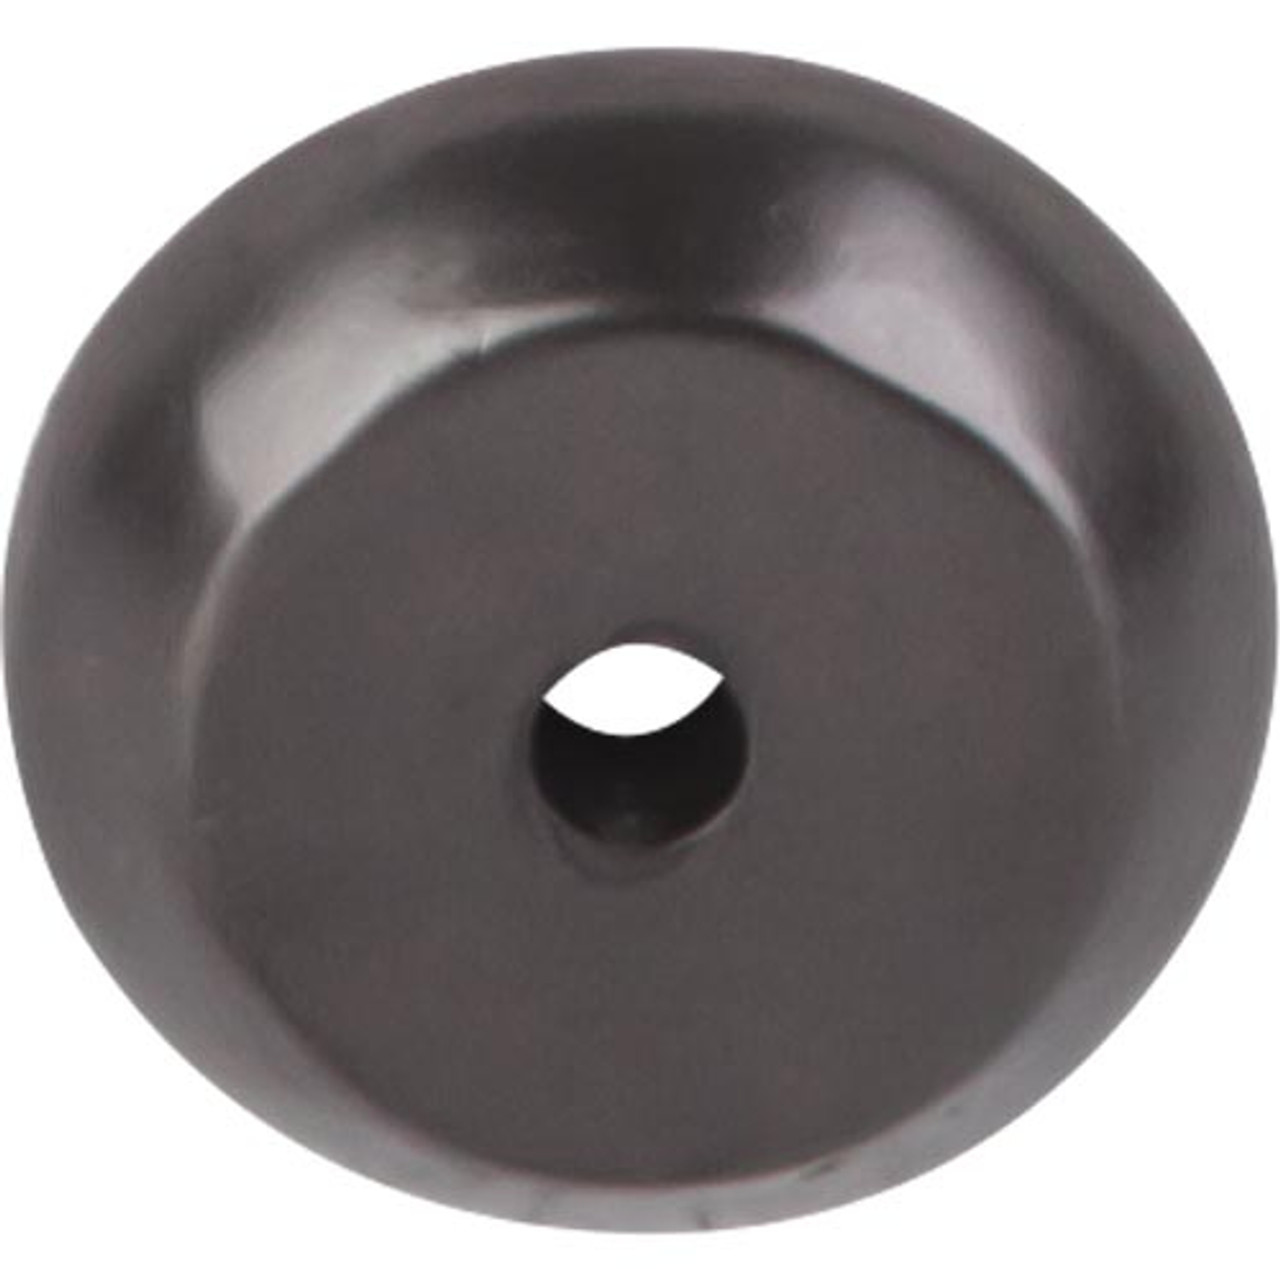 Top Knobs - Aspen Round Backplate  - Medium Bronze (TKM1457)